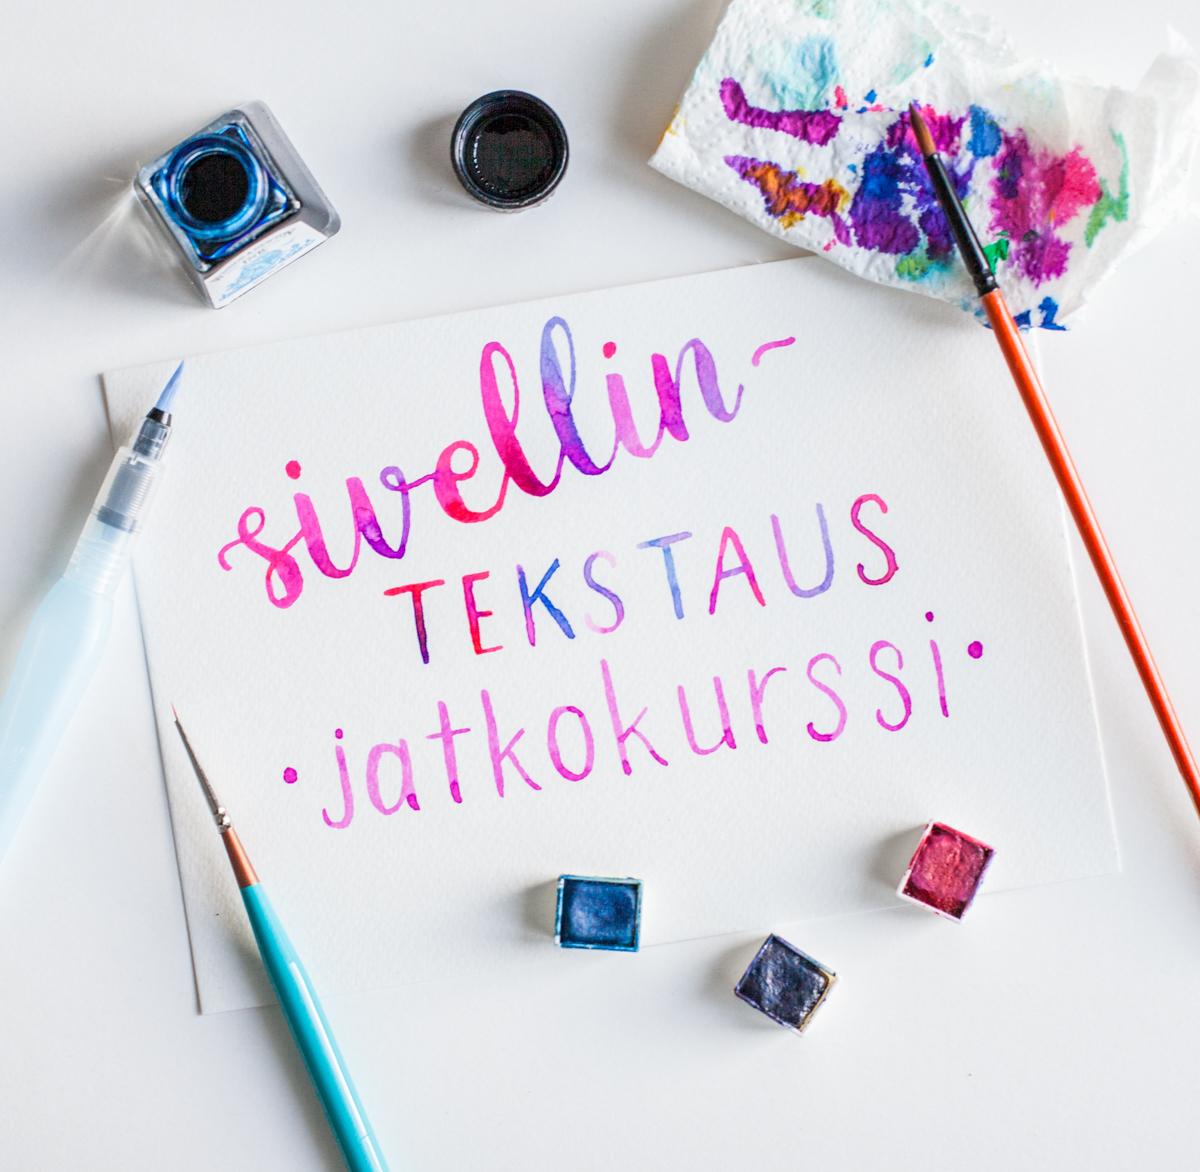 Sivellintekstaus - jatkokurssi / Turku